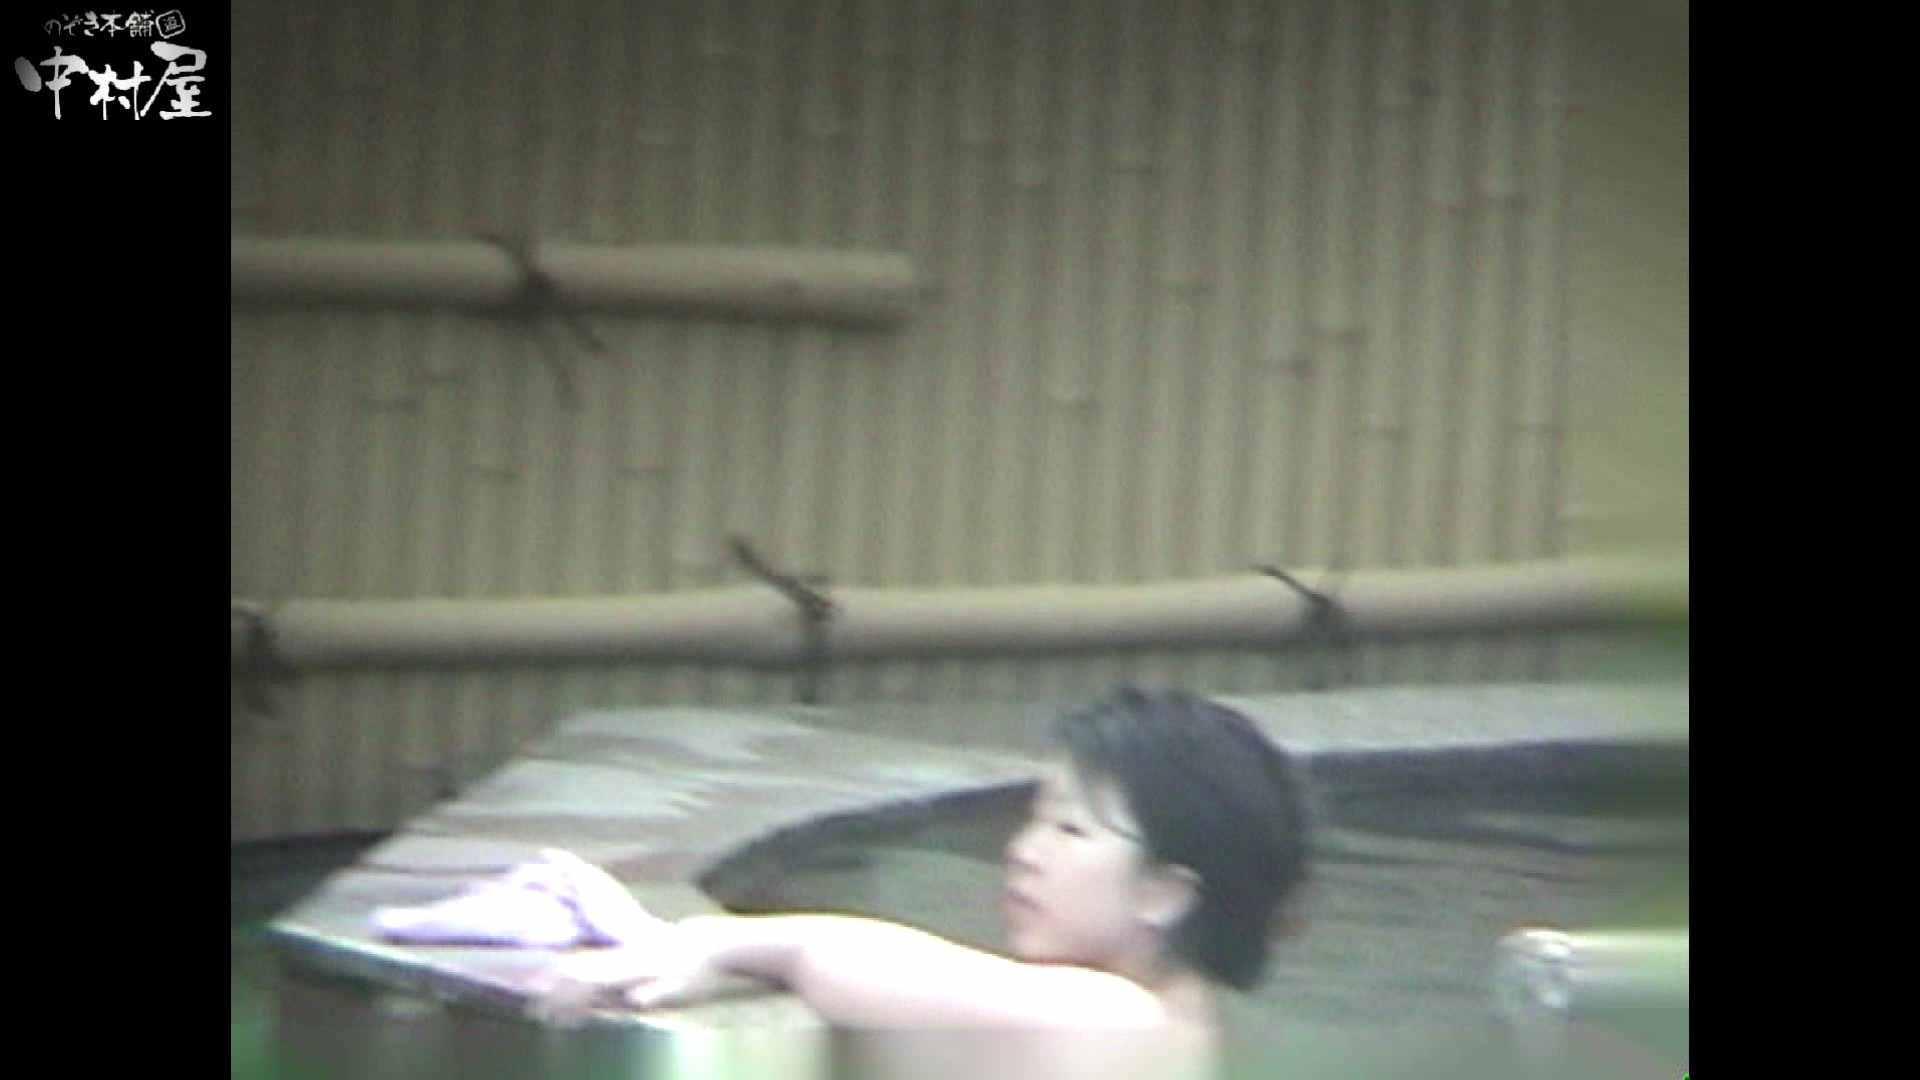 Aquaな露天風呂Vol.936 OLセックス 覗きぱこり動画紹介 75画像 5